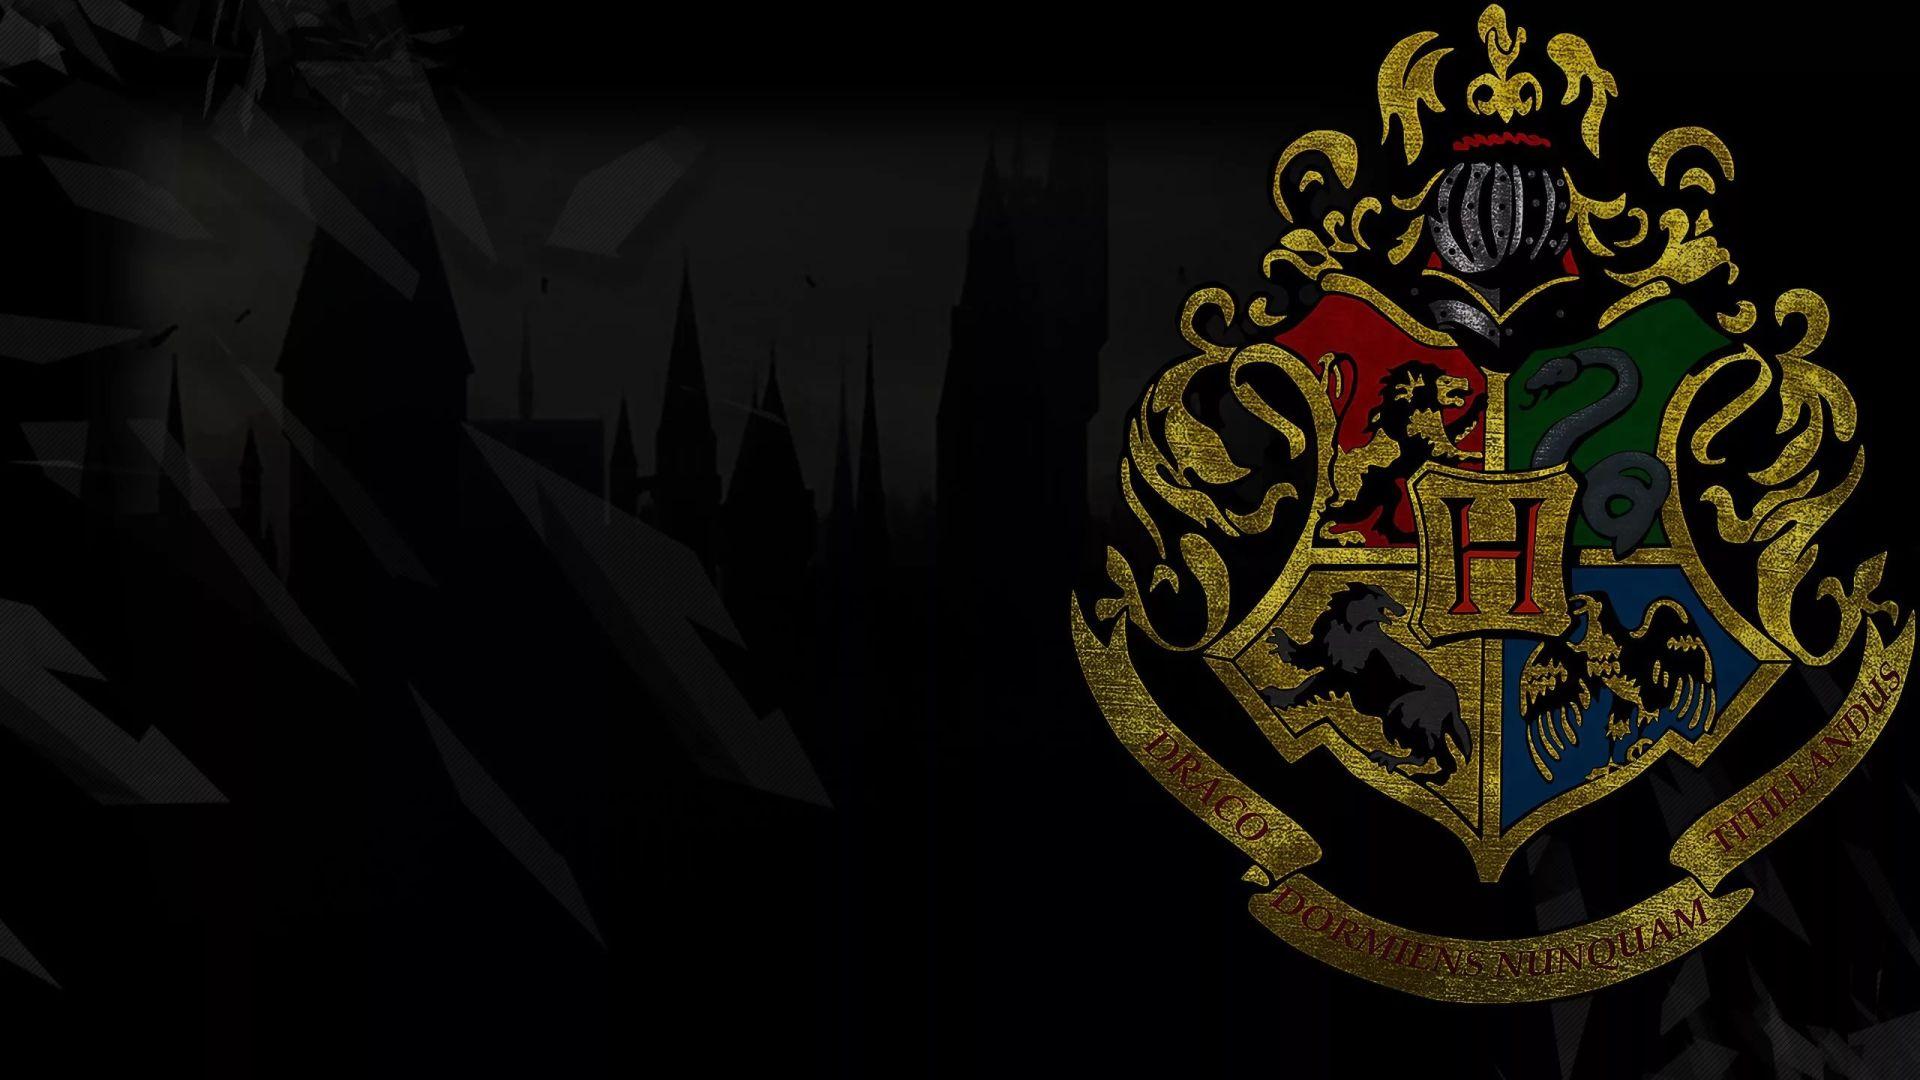 Harry Potter 1080p Wallpaper